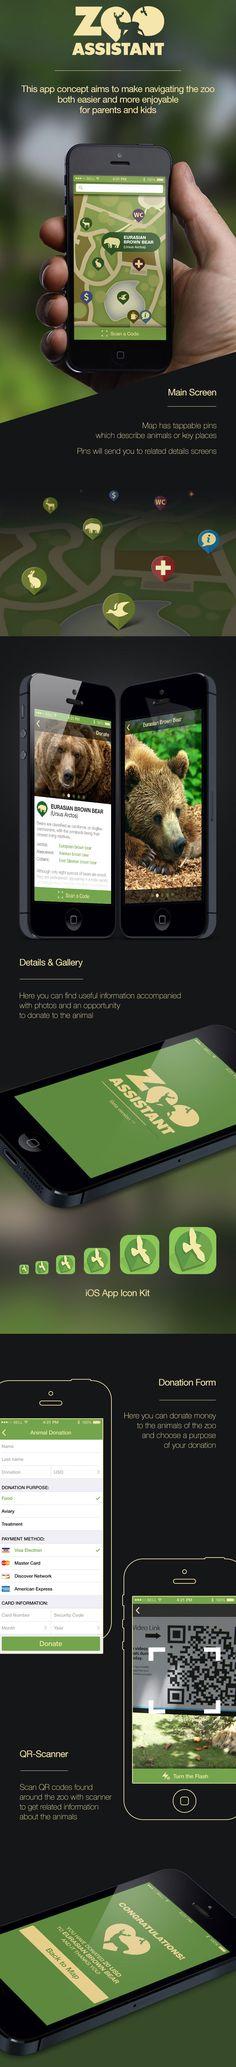 Unique App Design, Zoo Assistant via @rodrigofjaramil #App #Design